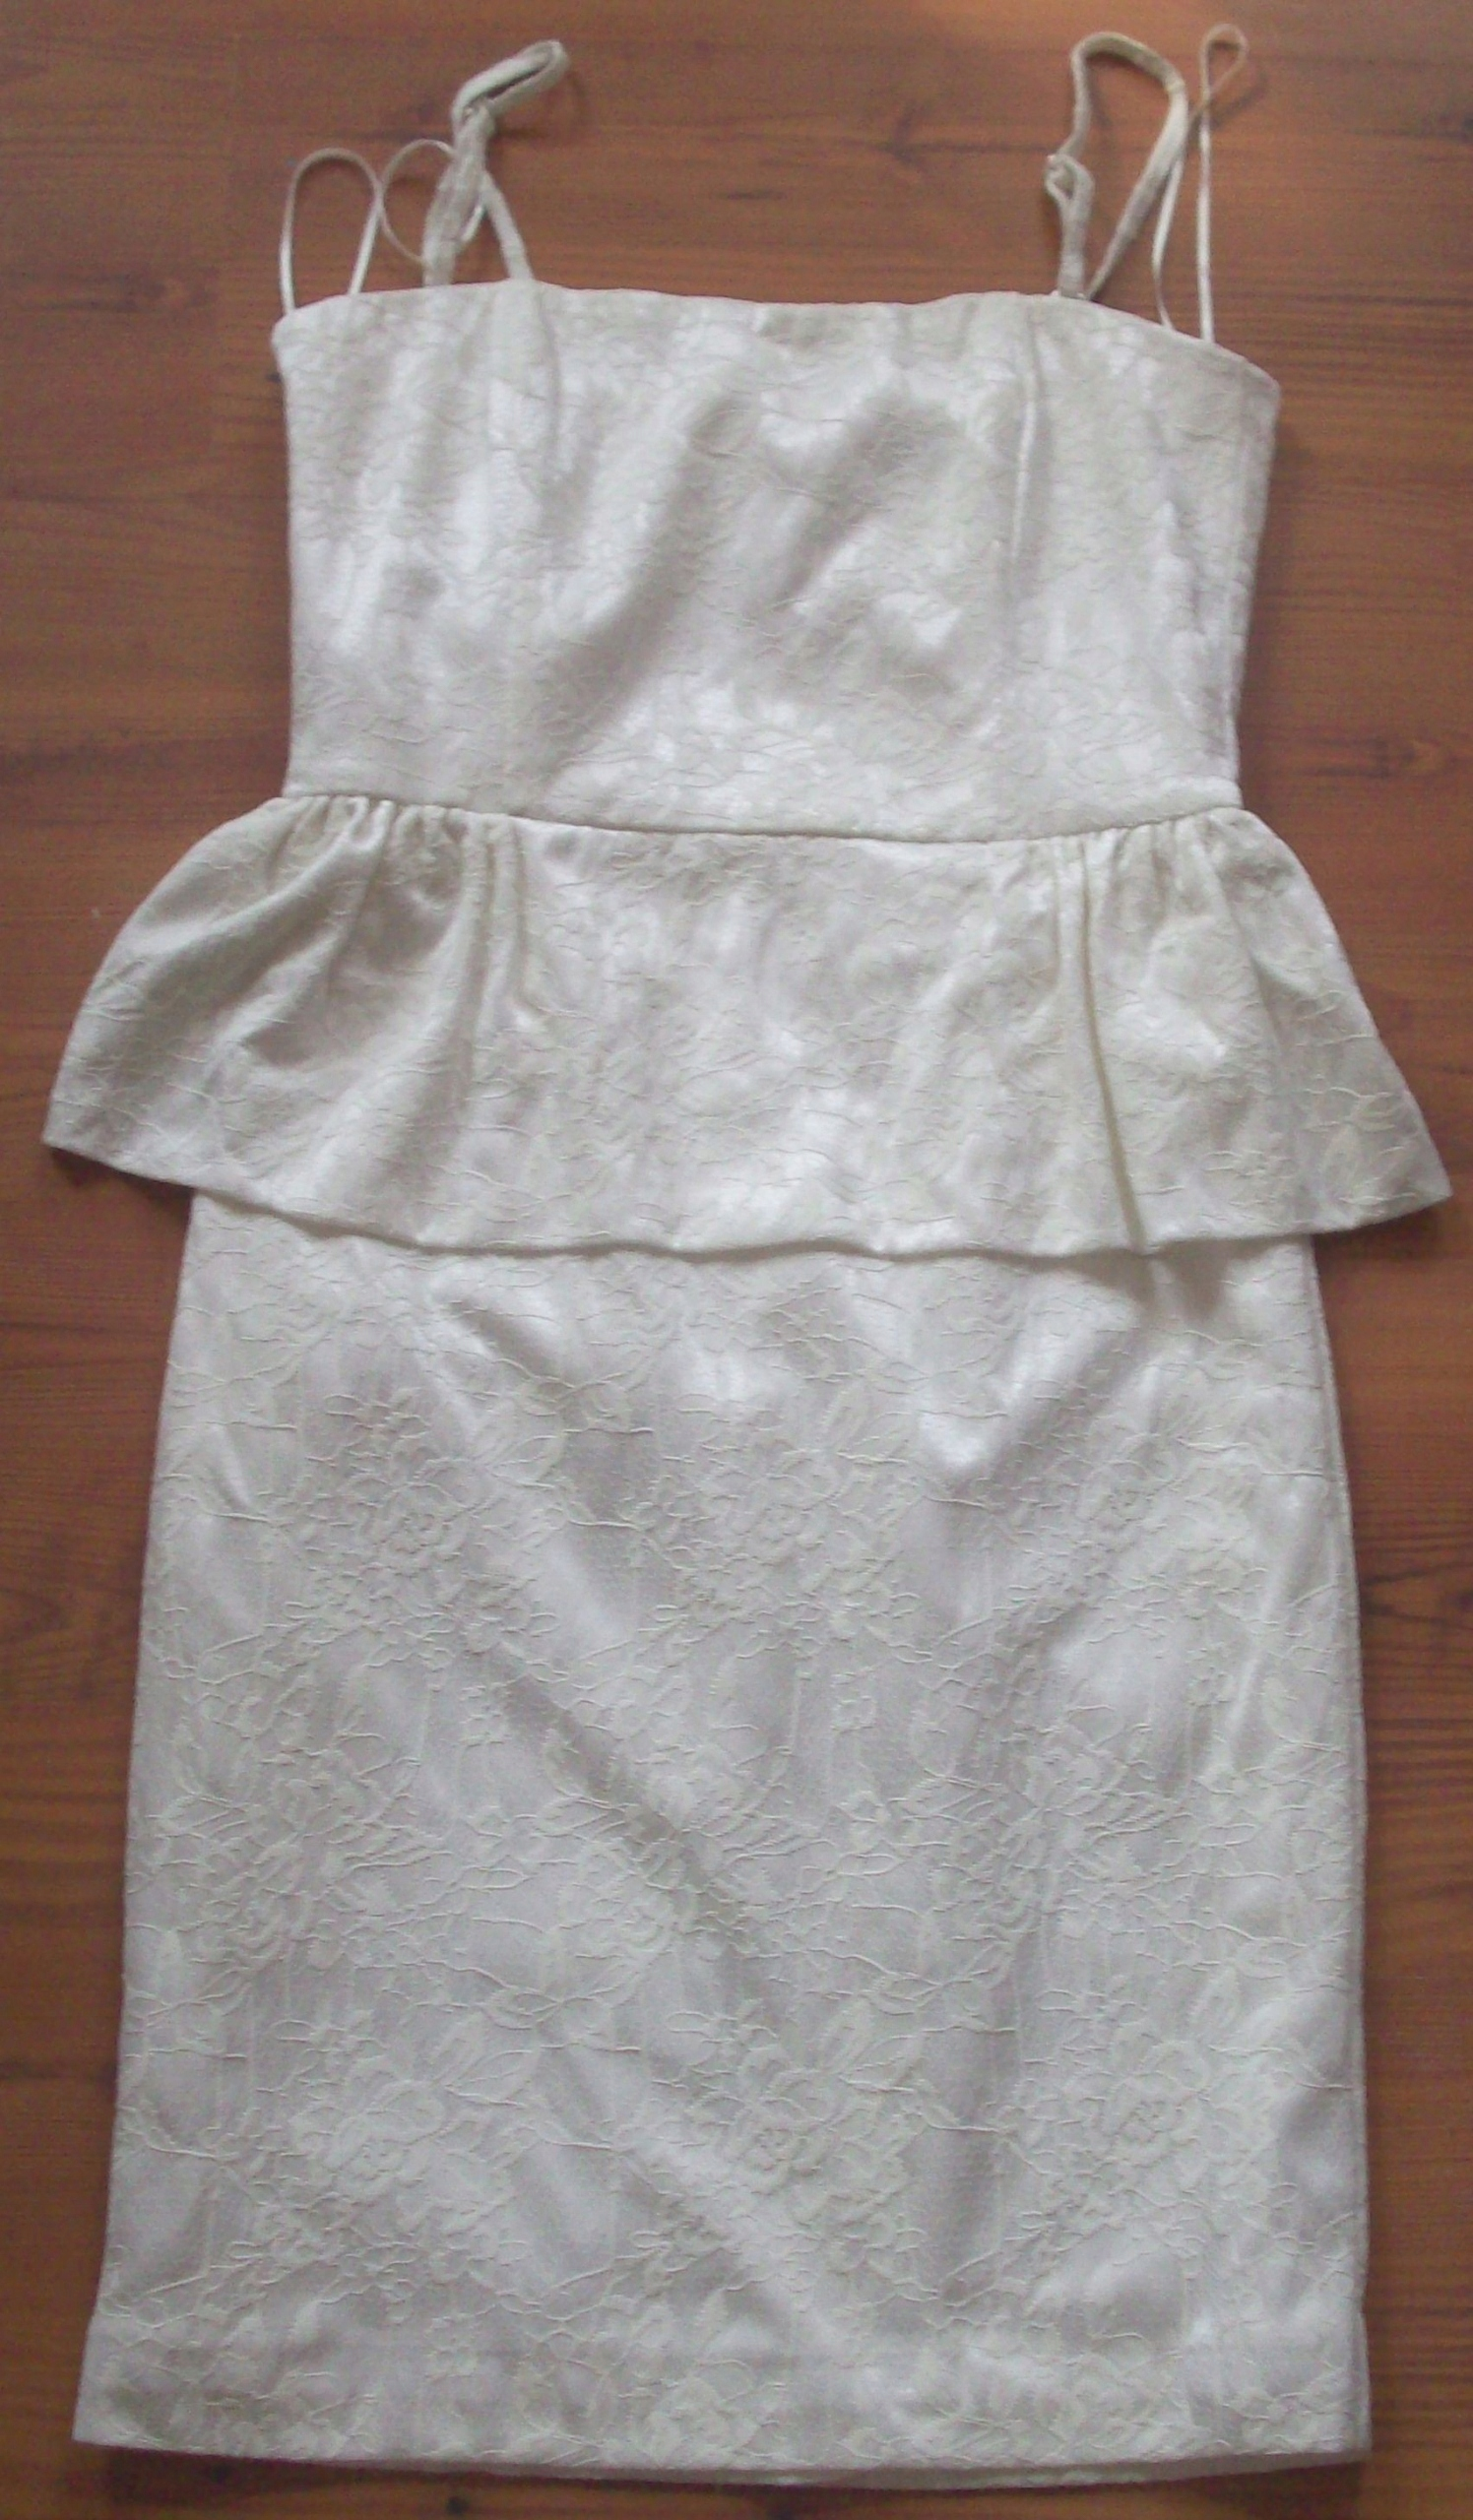 0cf98d431e Sukienka ecru koronka Pretty girl 38 M - 7551937011 - oficjalne ...